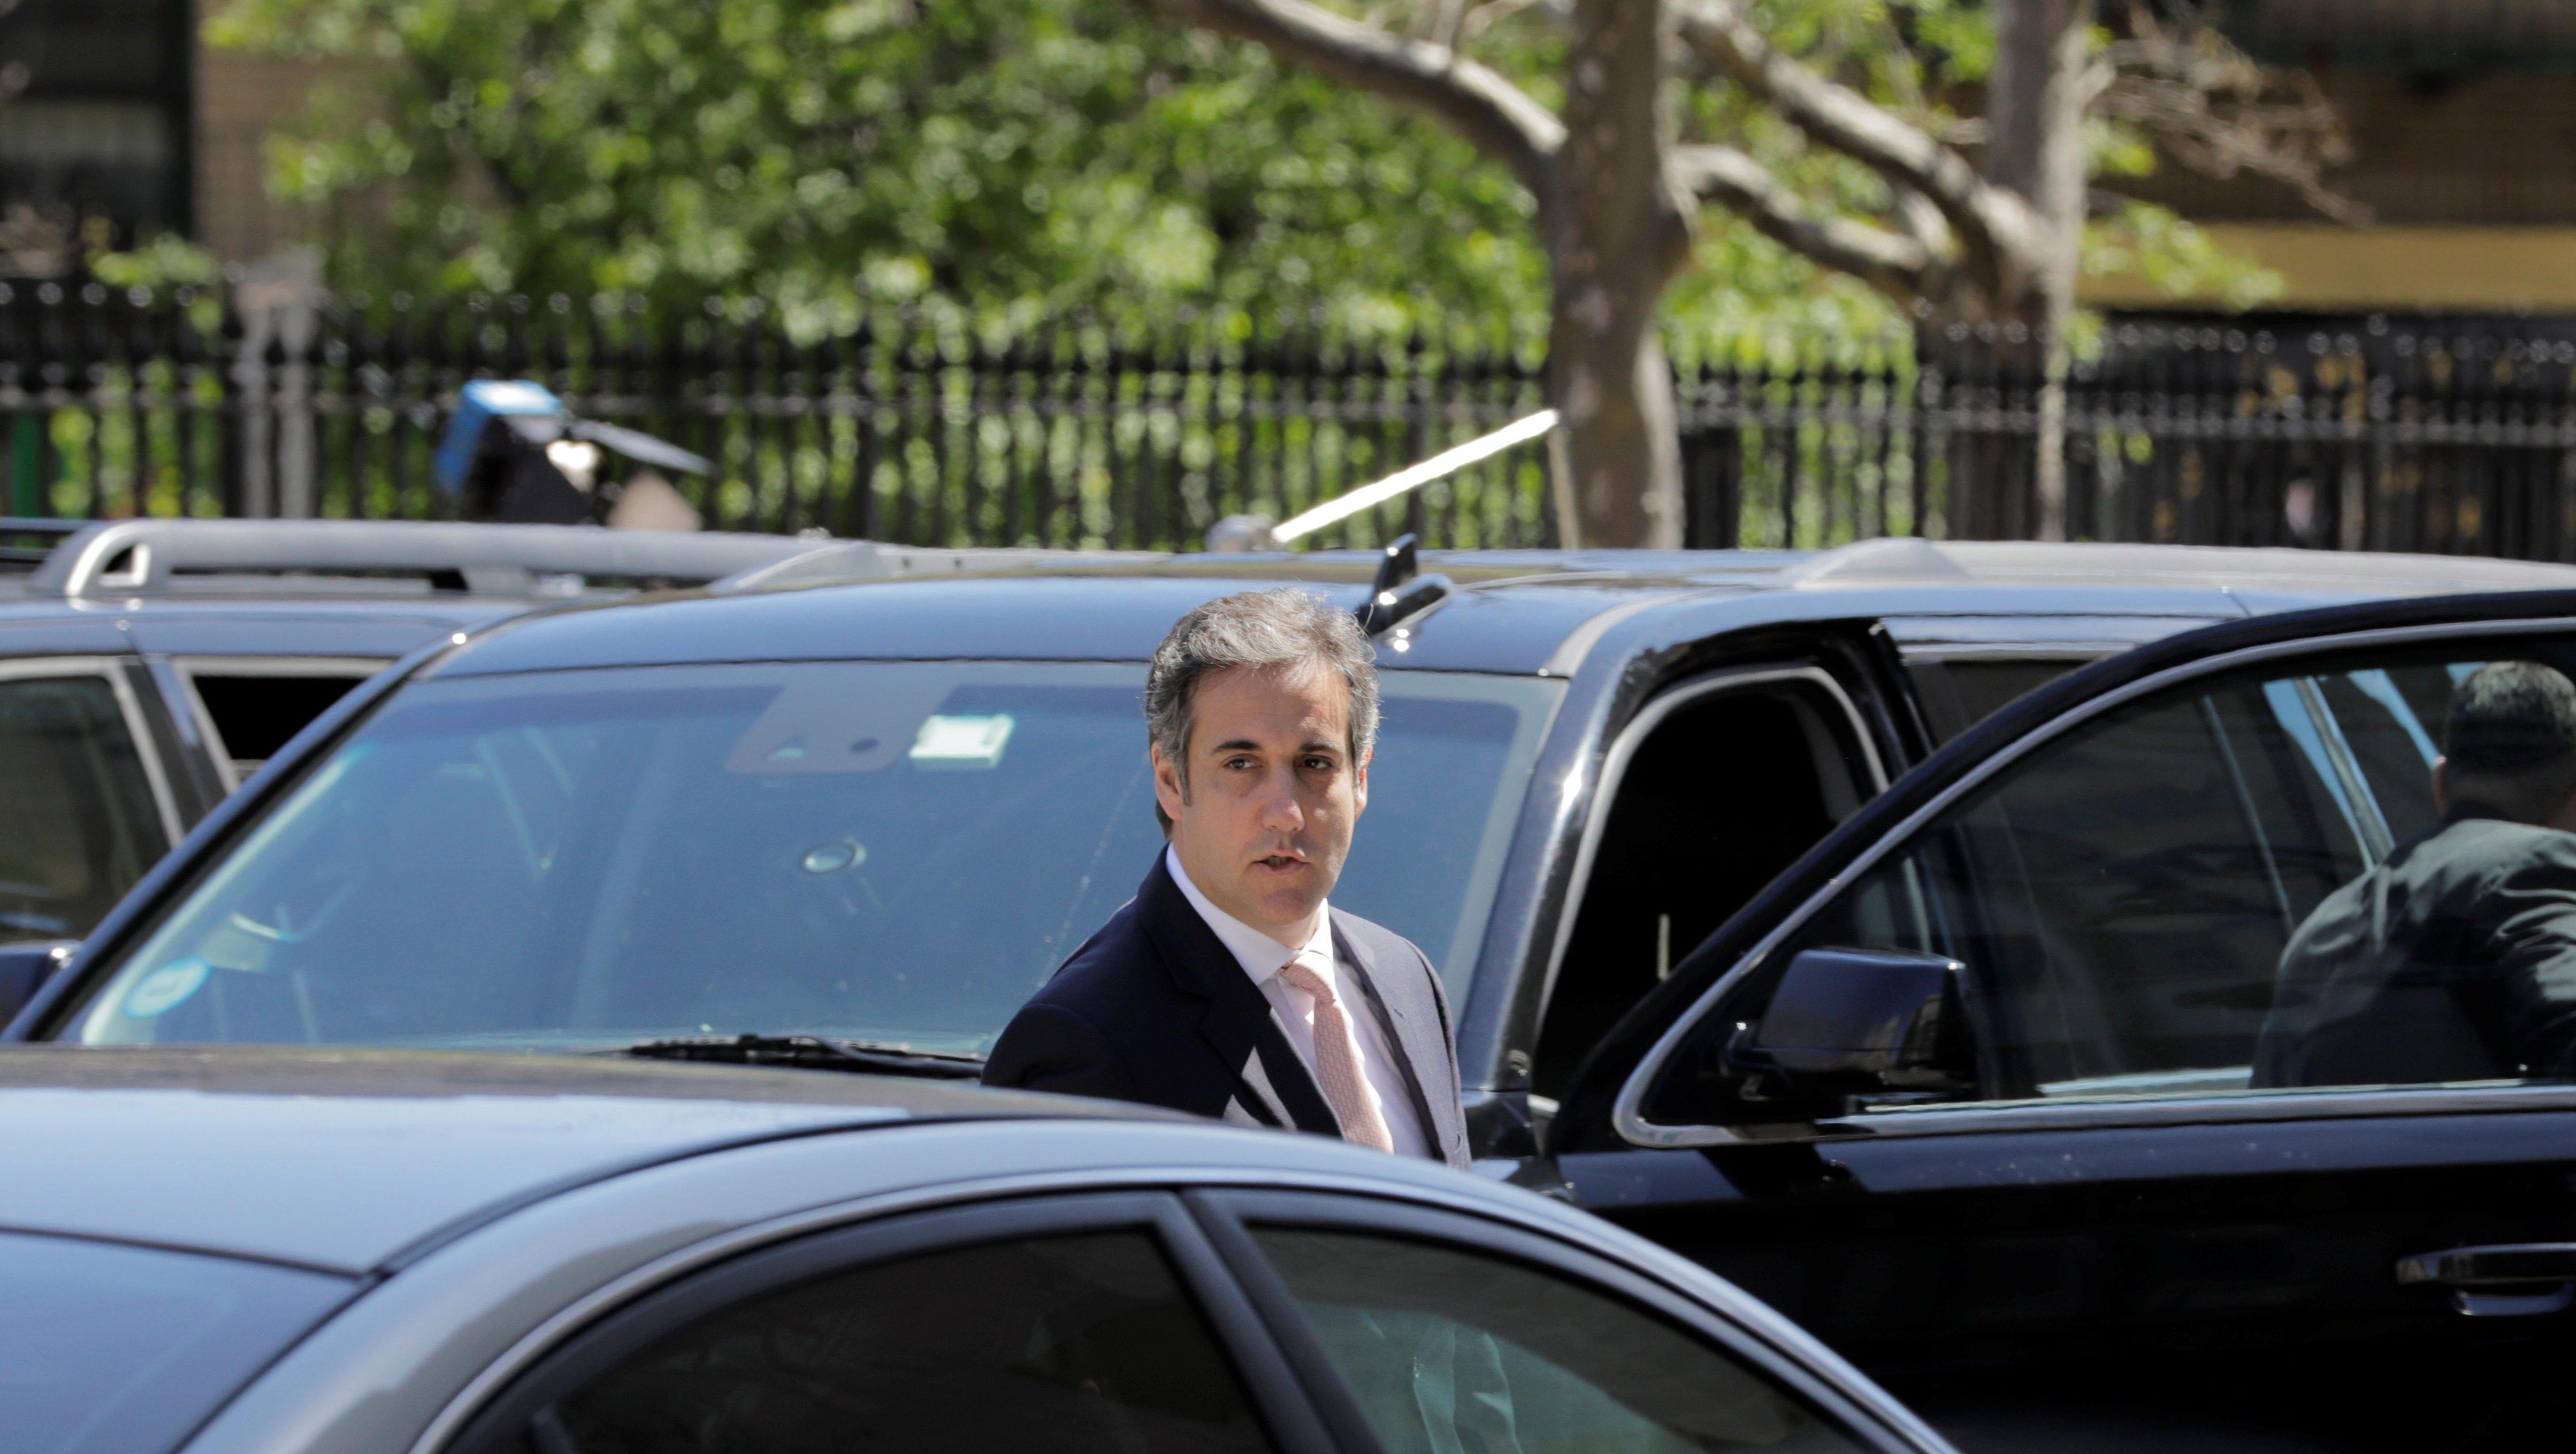 U.S. President Donald Trump's personal lawyer Michael Cohen